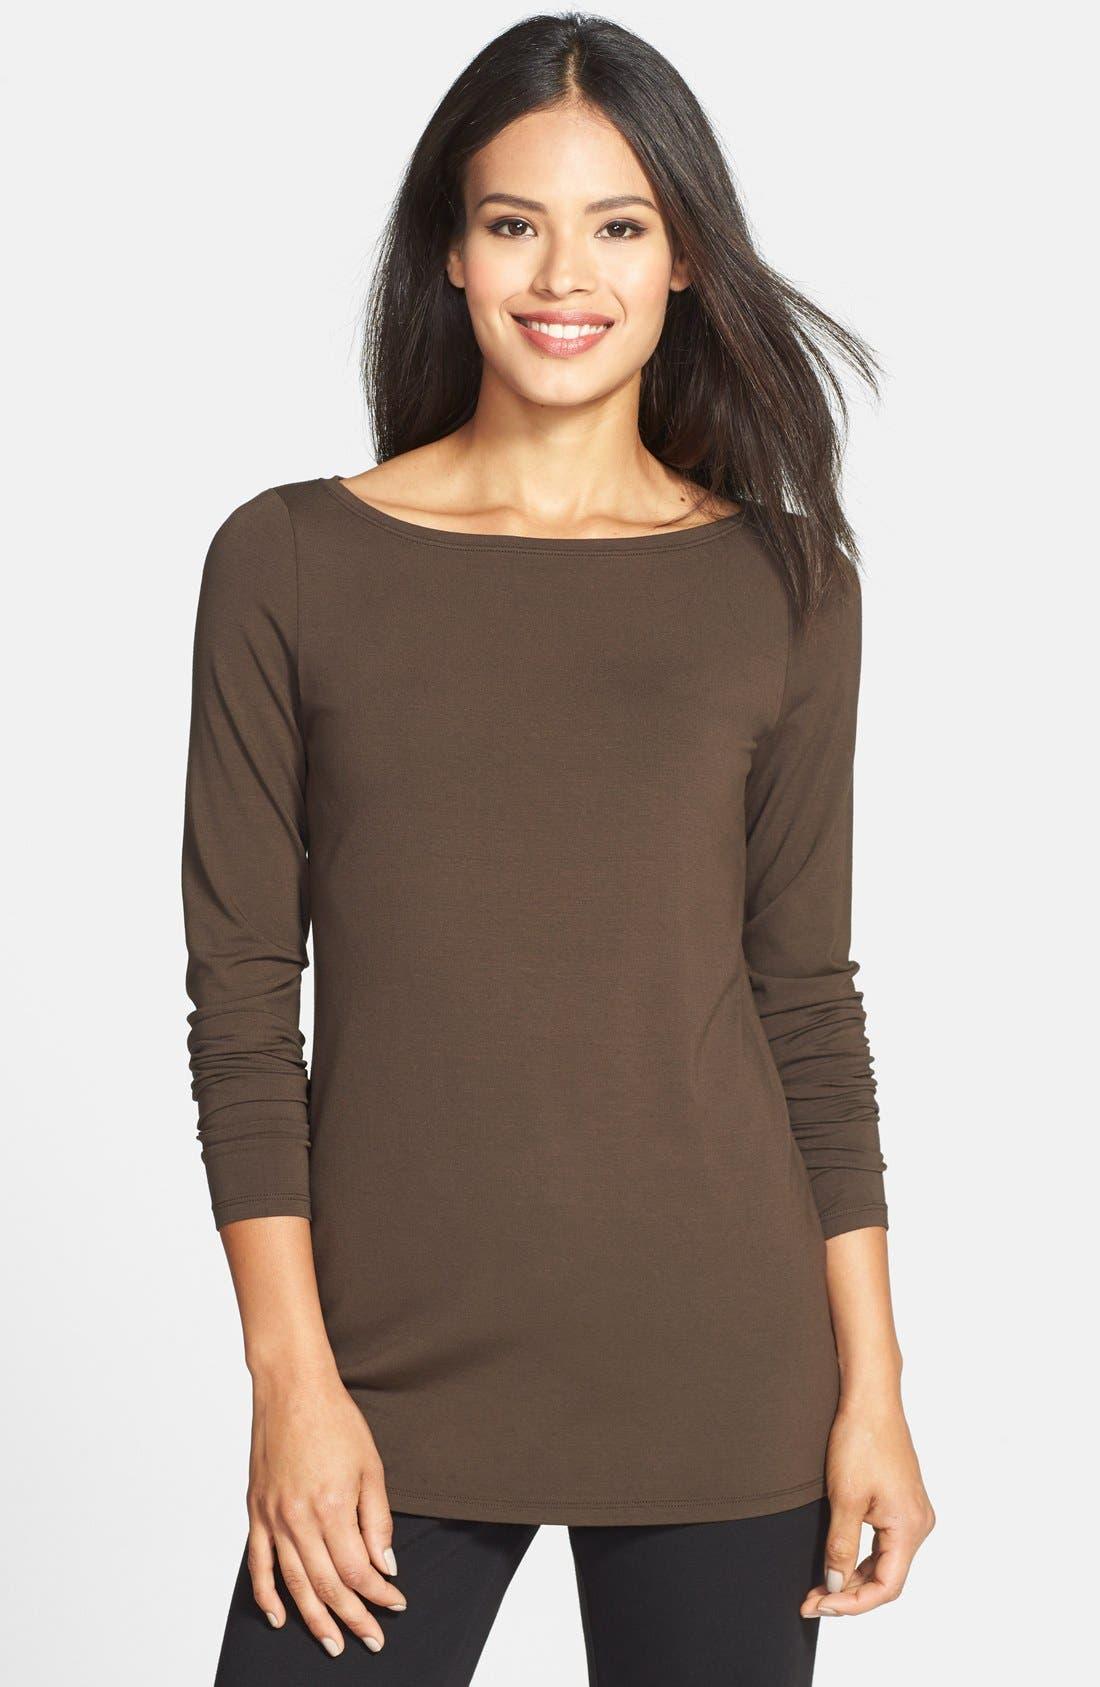 Alternate Image 1 Selected - Eileen Fisher Bateau Neck Slim Jersey Top (Regular & Petite)